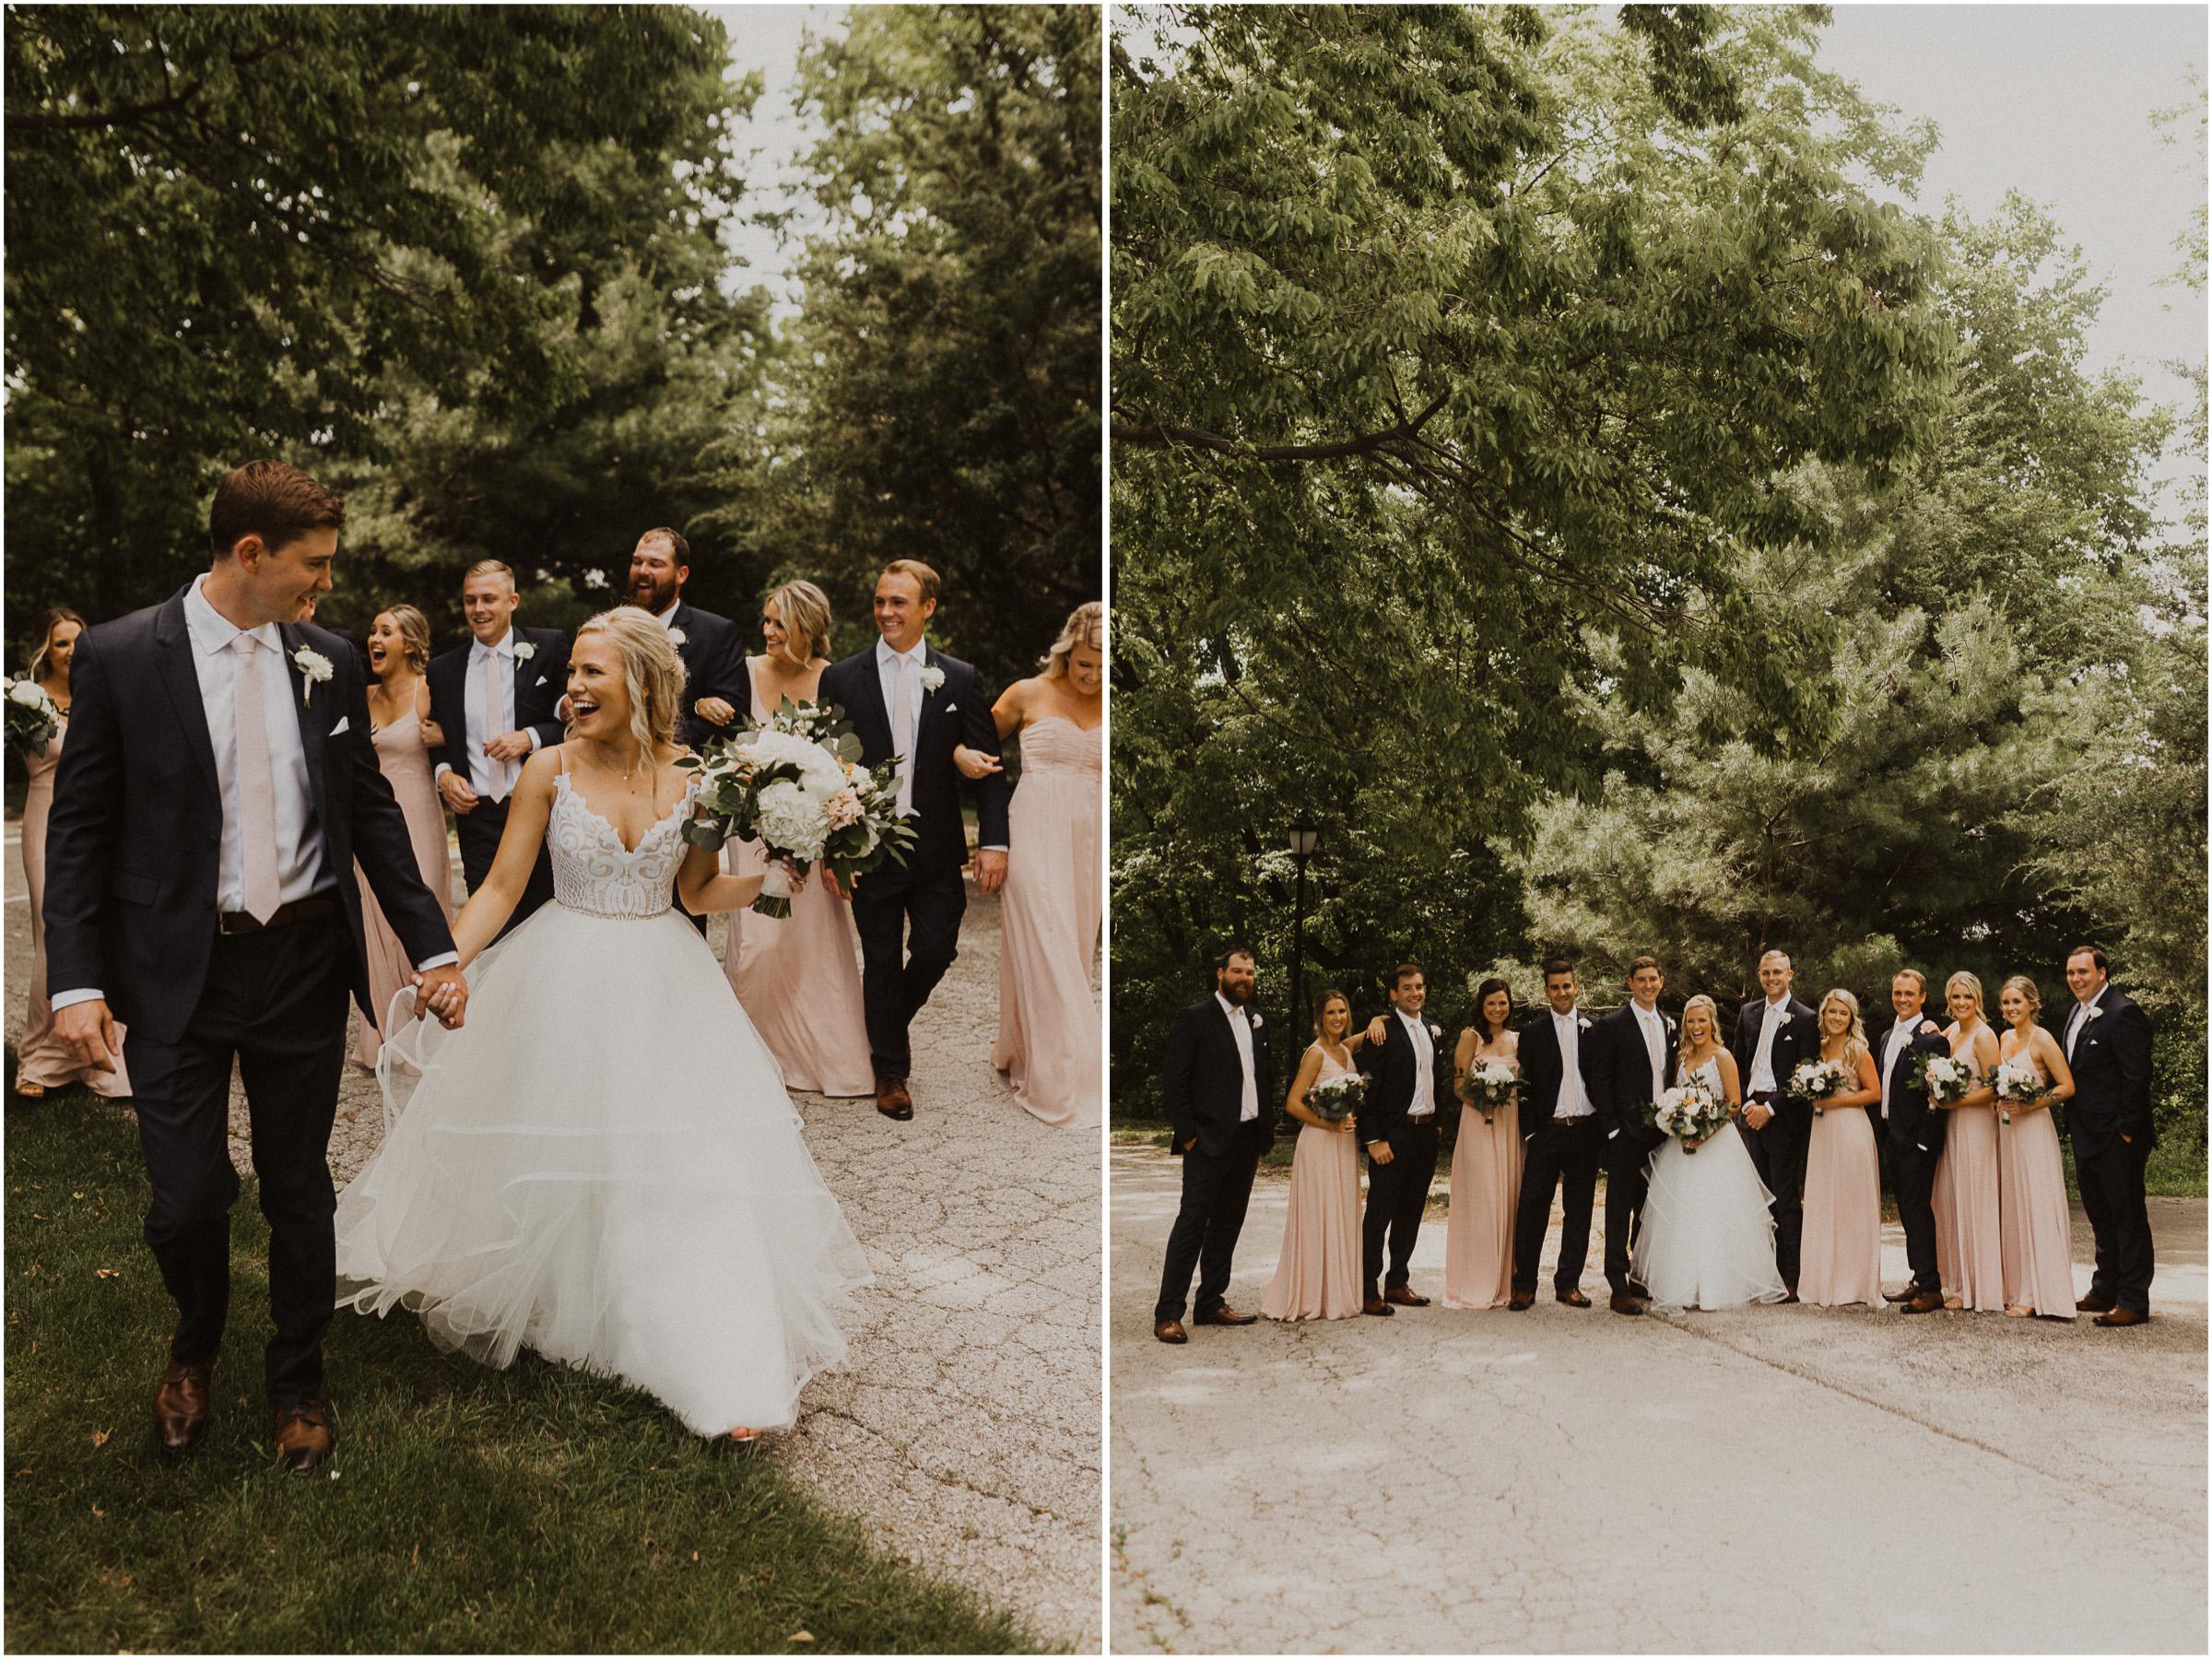 alyssa barletter photography hawthorne house summer outdoor wedding southern charm inspiration-26.jpg